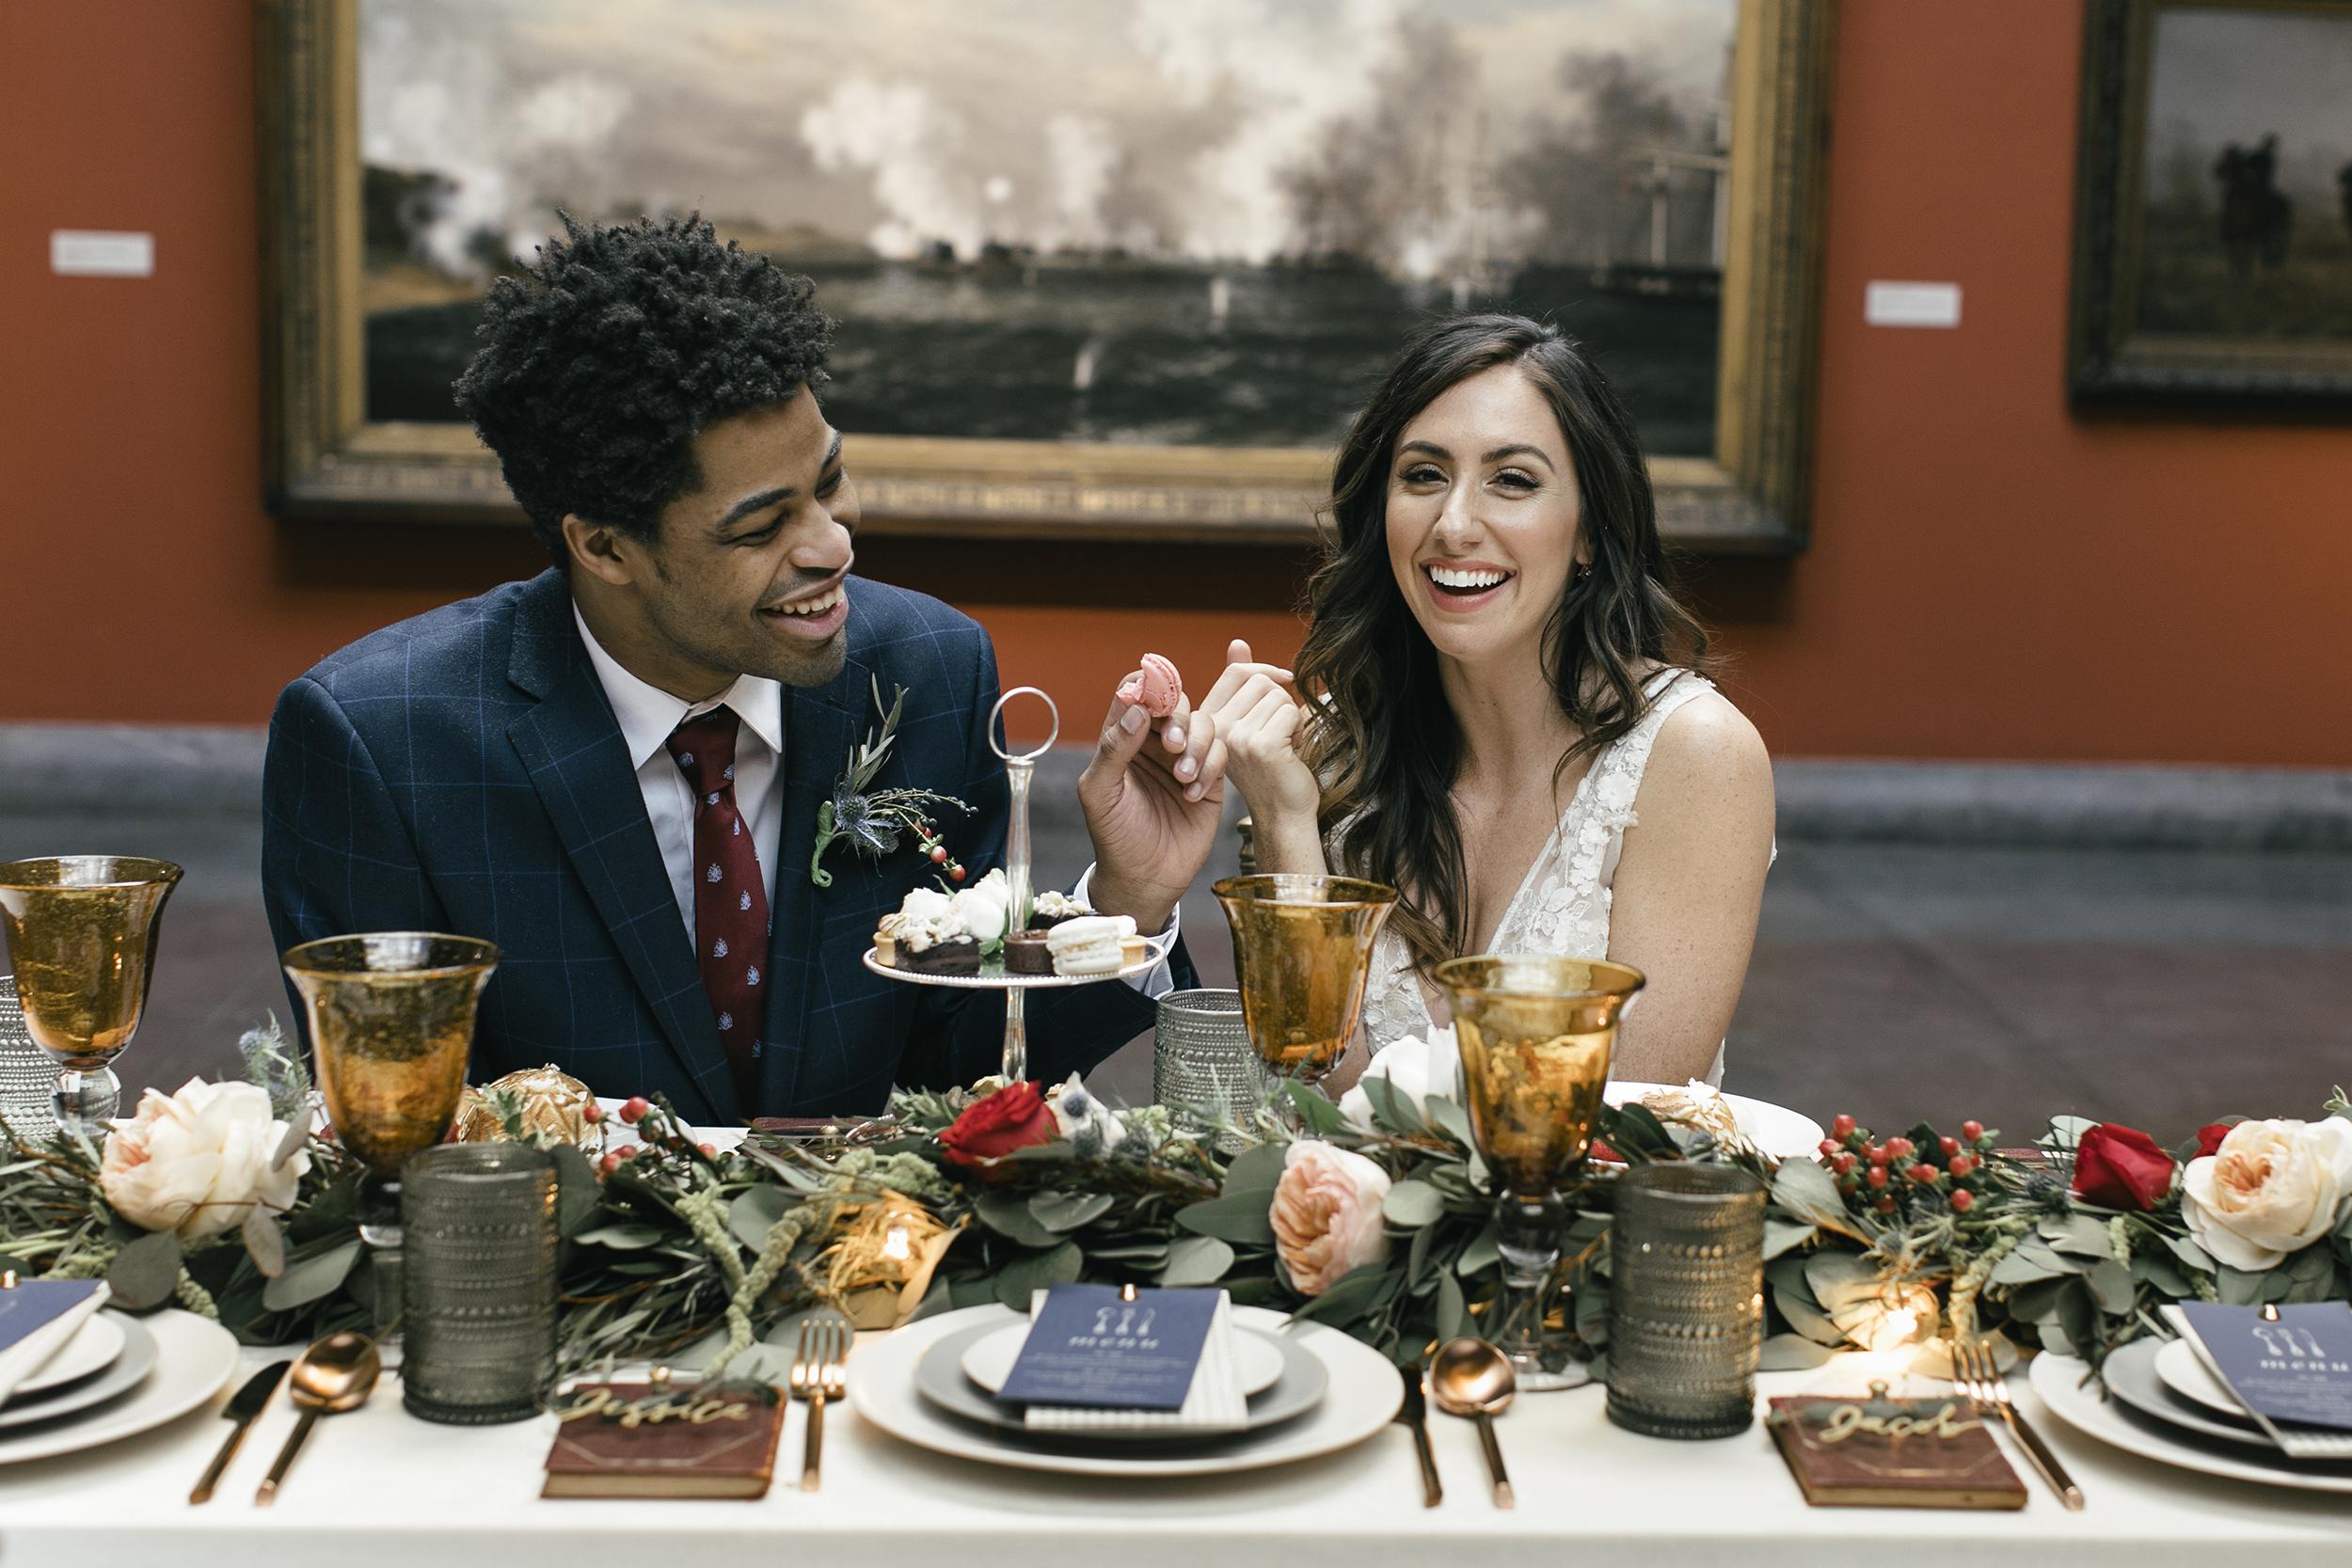 photography-wedding-weddings-natural-candid-pafa-pennsylvania academy-philadephia-philly-philadelphia wedding-mixed race-editorial-modern-fine-art-052.JPG